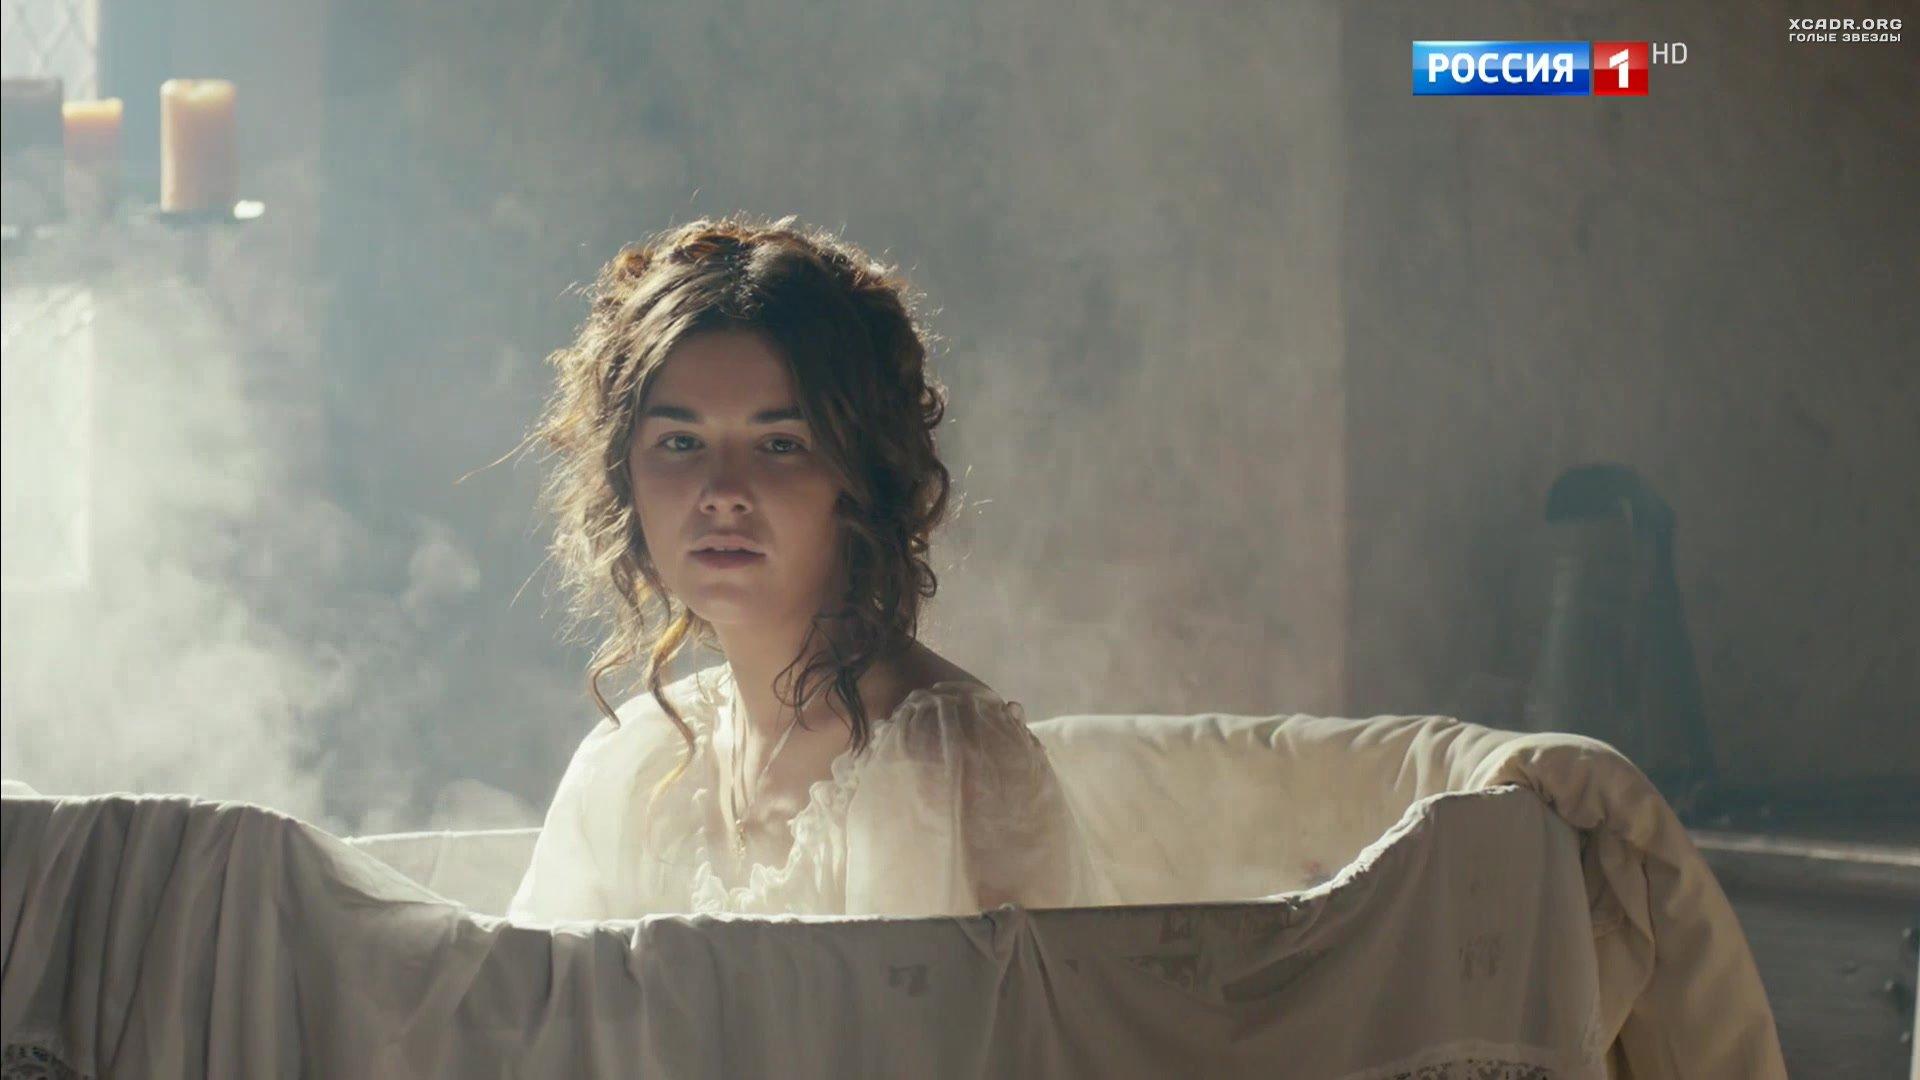 Маша Андреева Фото Обнаженную